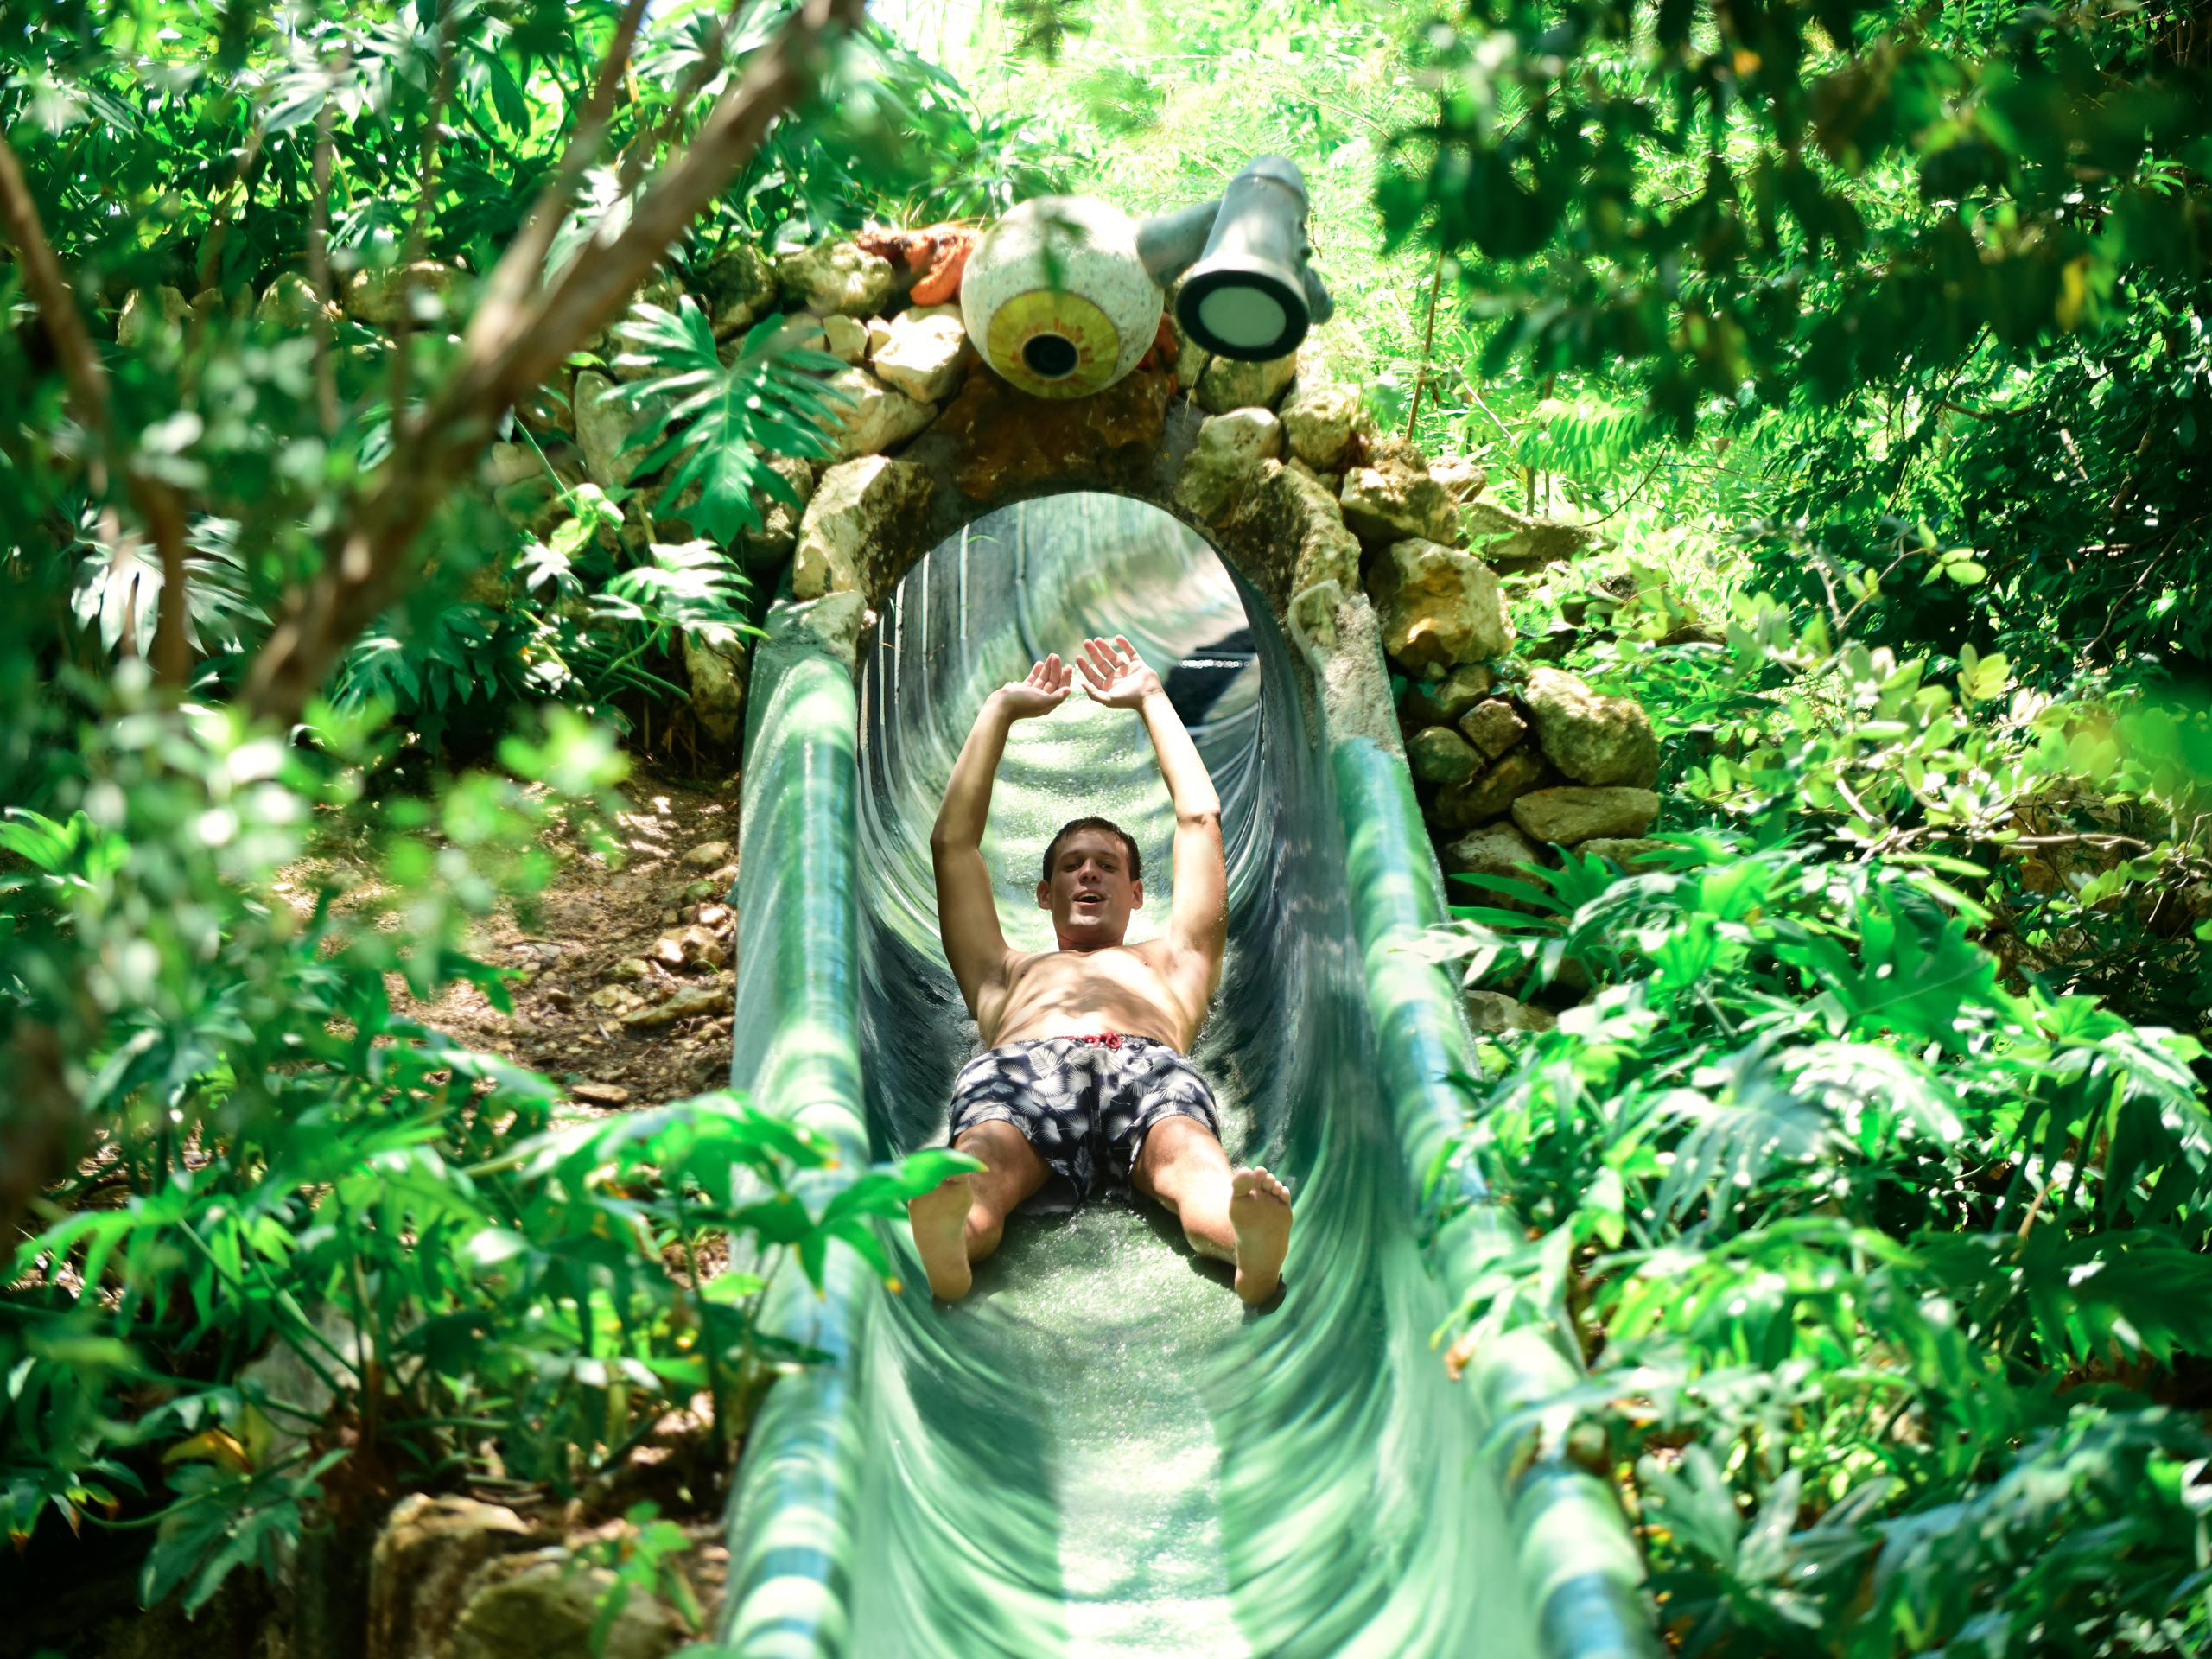 Parque xplor tobogan